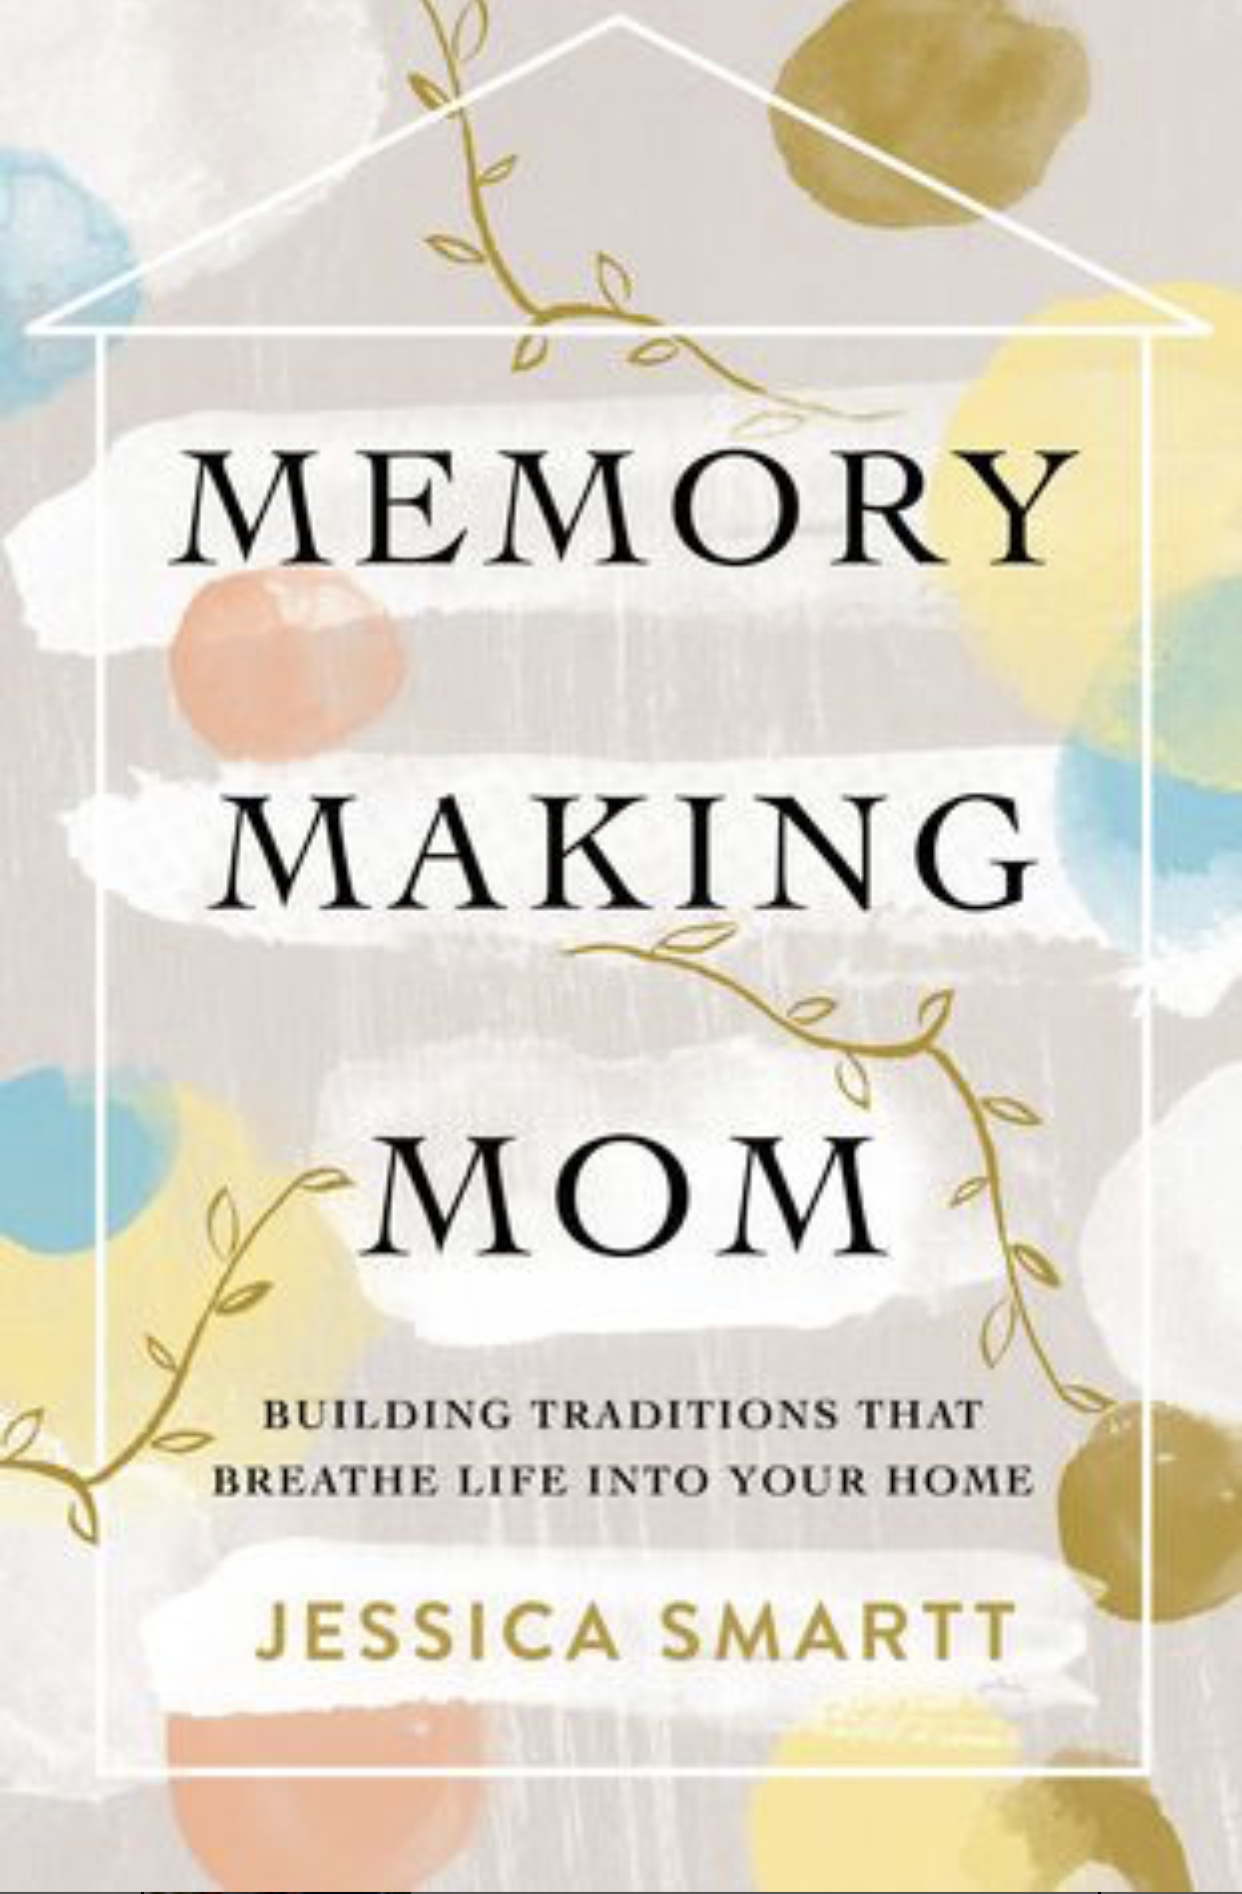 memorymakingmom.jpg